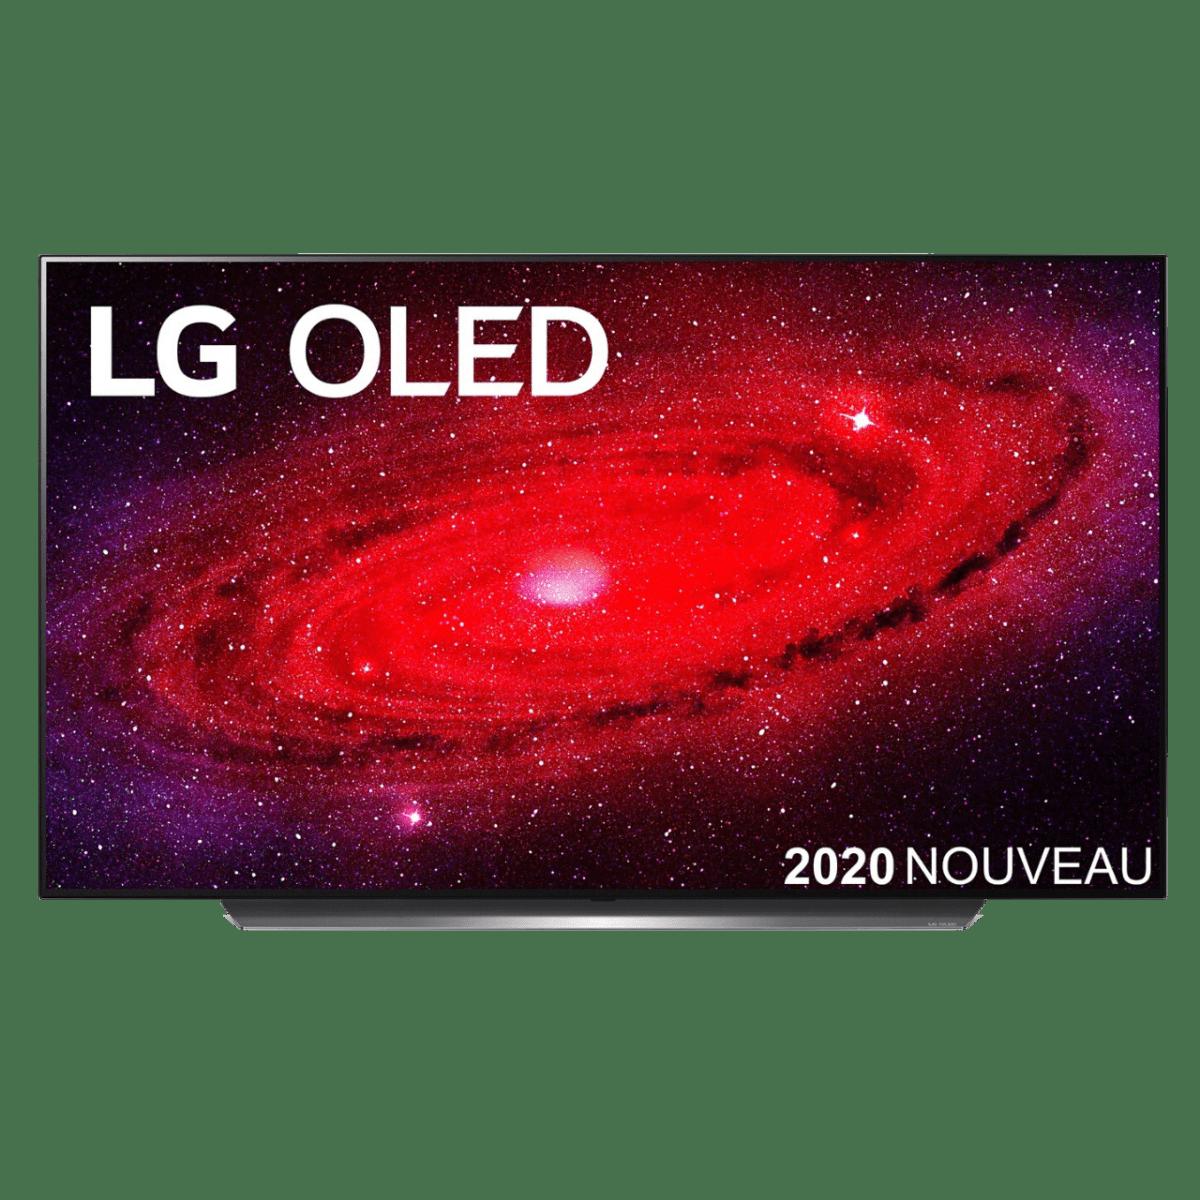 French Days : Les 5 meilleurs bons plans TV OLED, QLED et LED